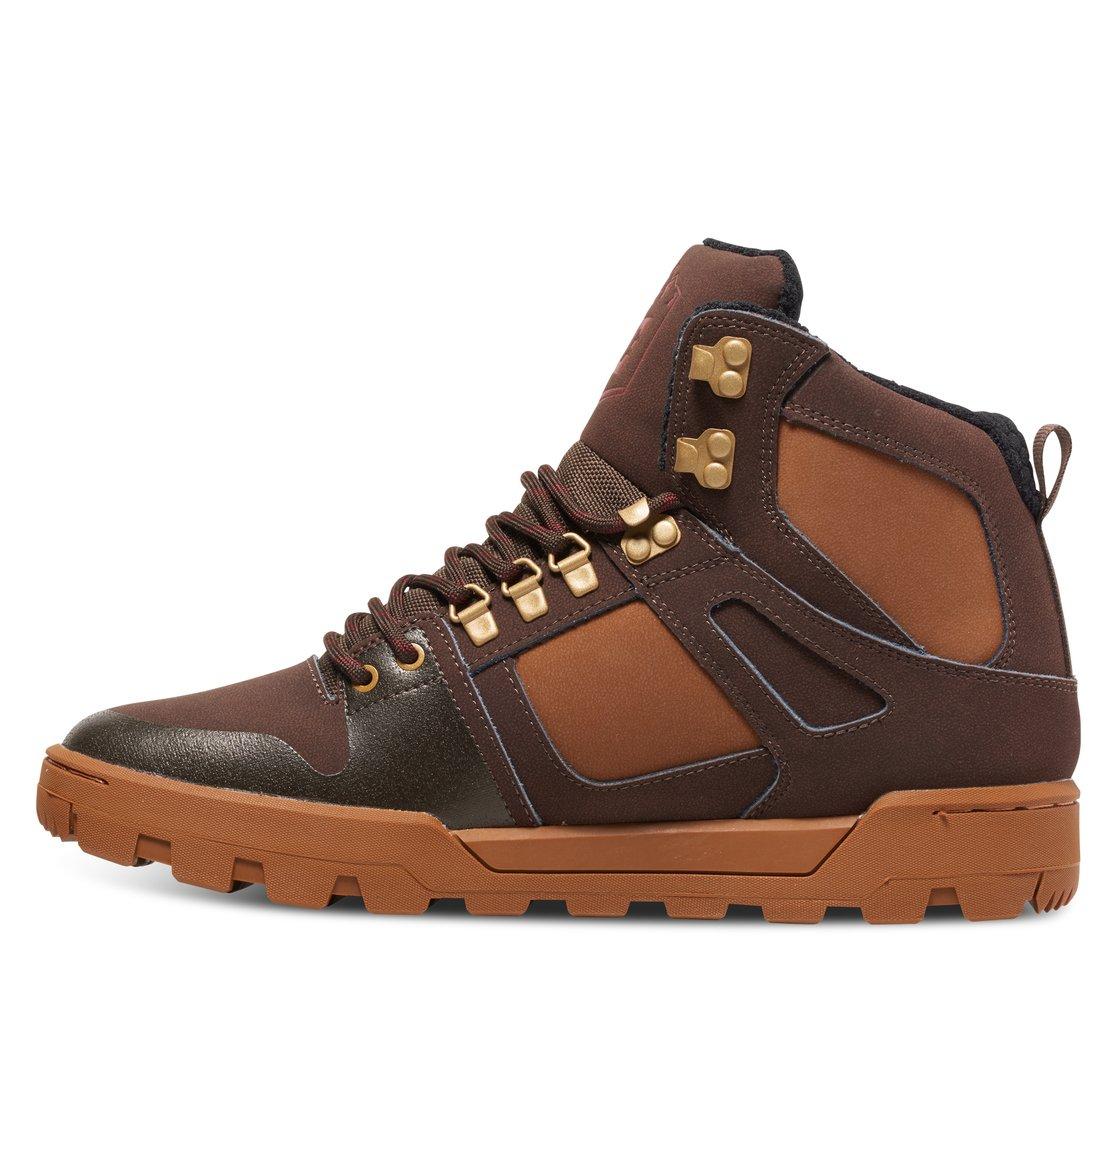 dc shoes spartan high wr boots adyb100001 ebay